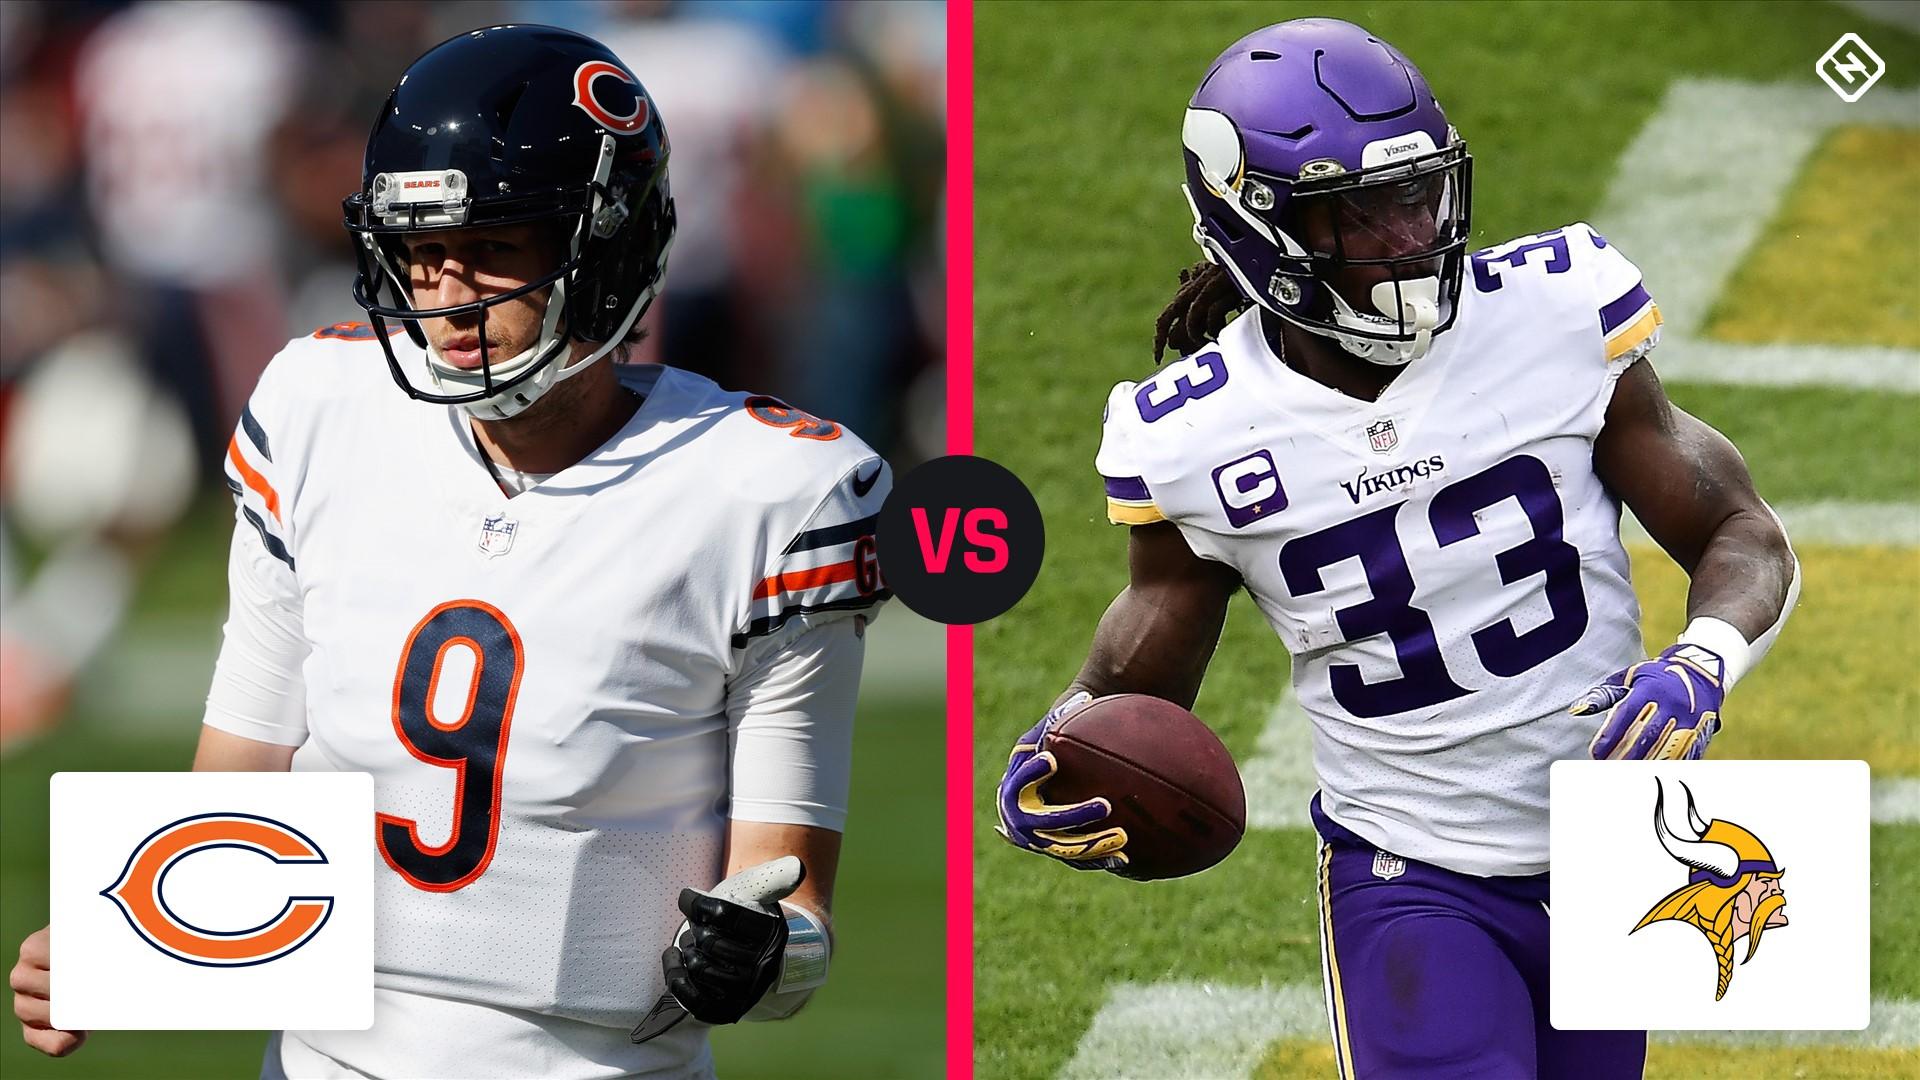 Bears vs vikings betting predictions today ufc 192 betting odds